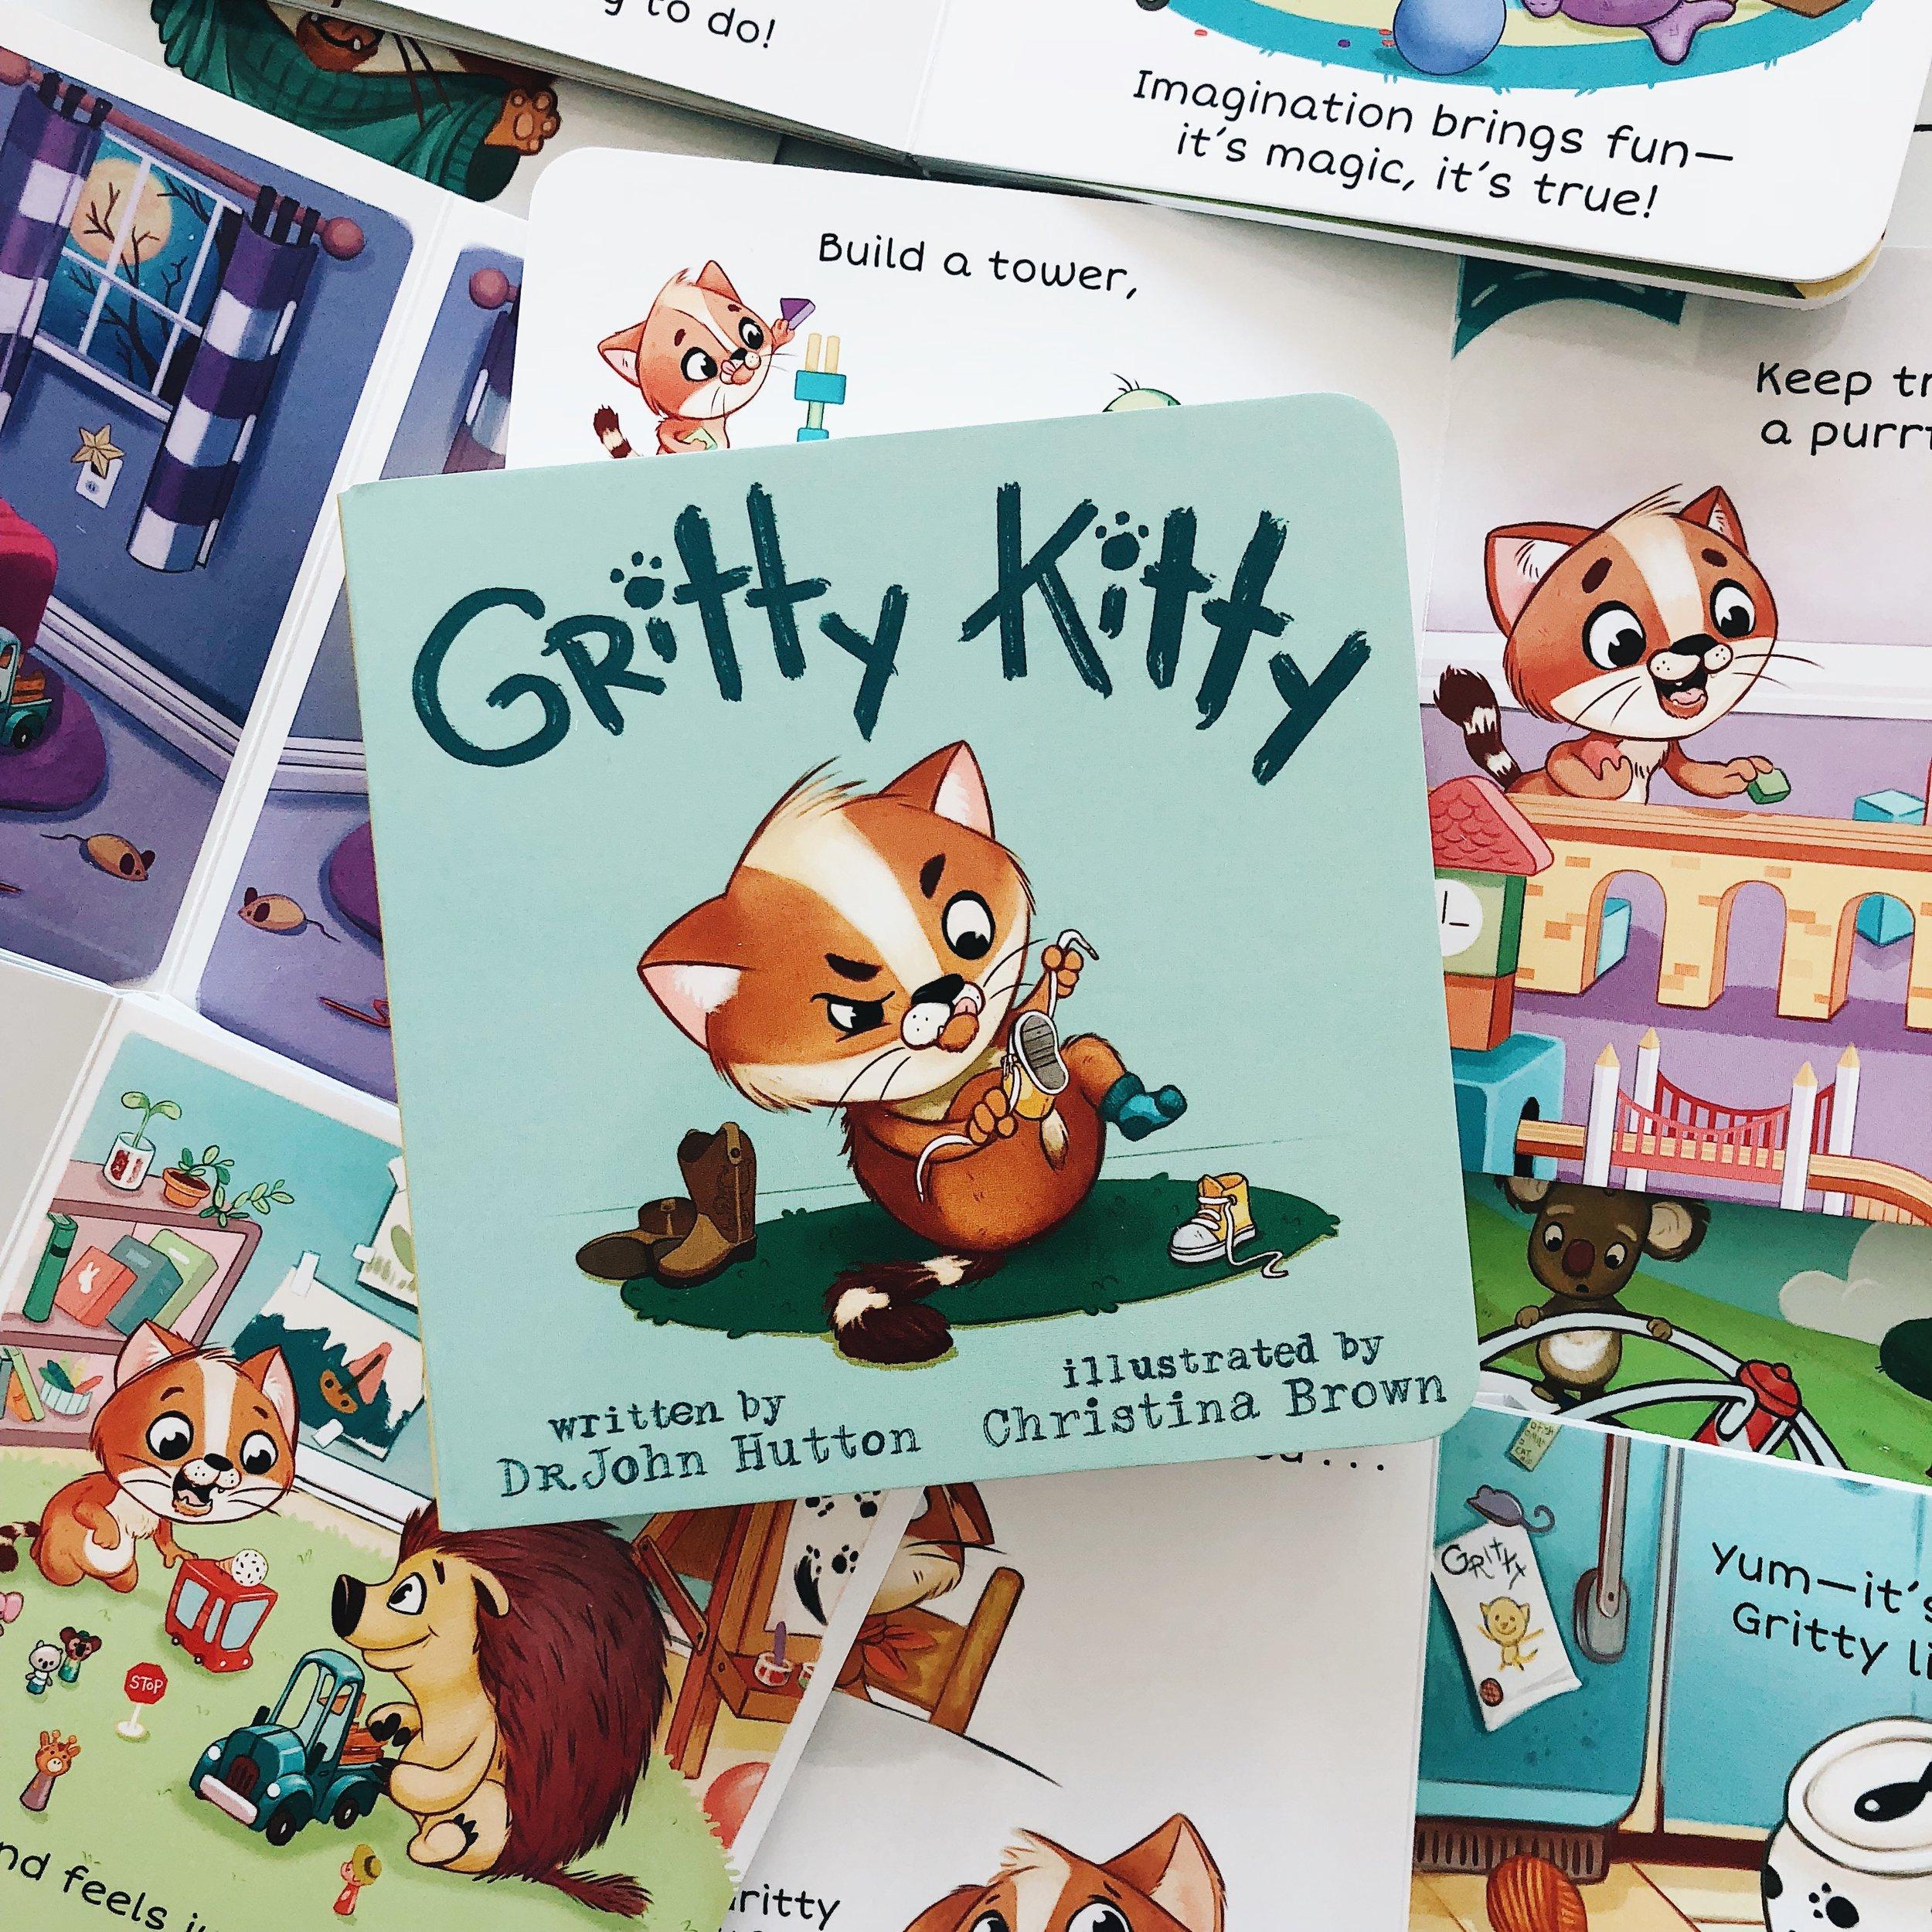 blue manatee press_board book_gritty kitty_dr. john hutton_christina brown_2.JPG